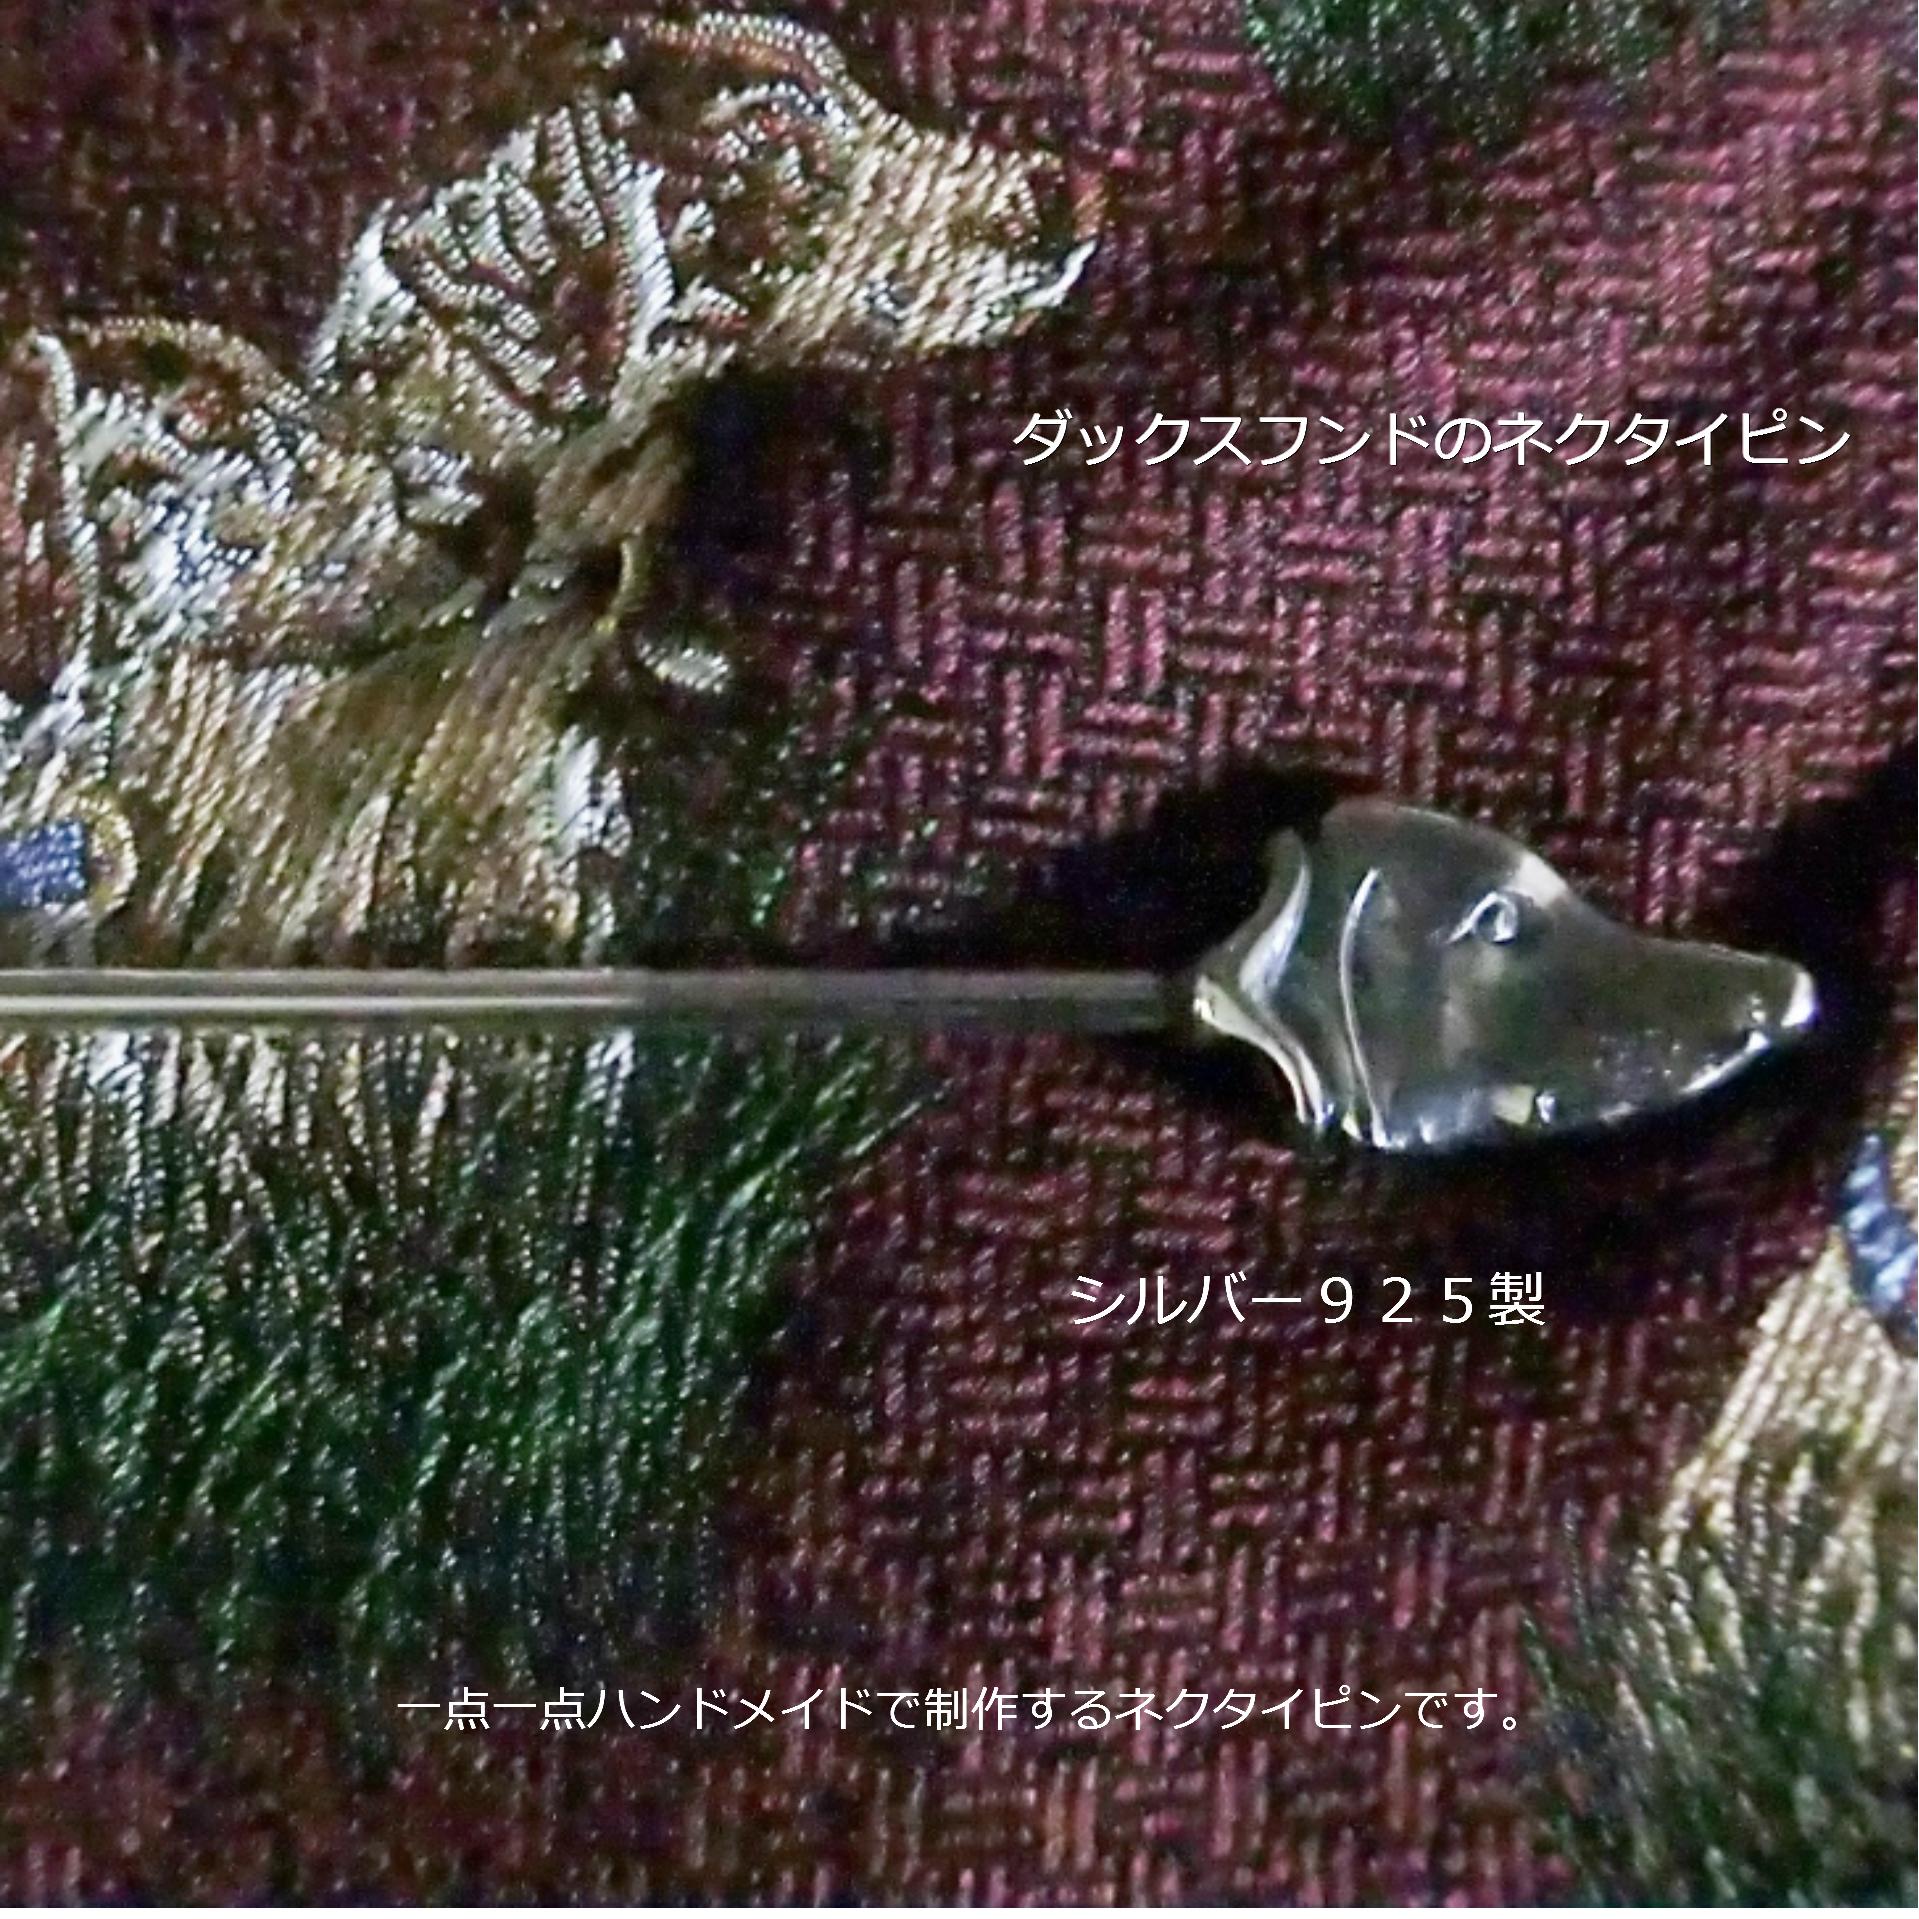 MASCOT TIE PIN -Silver Dachs- ダックスフントのネクタイピン シルバー